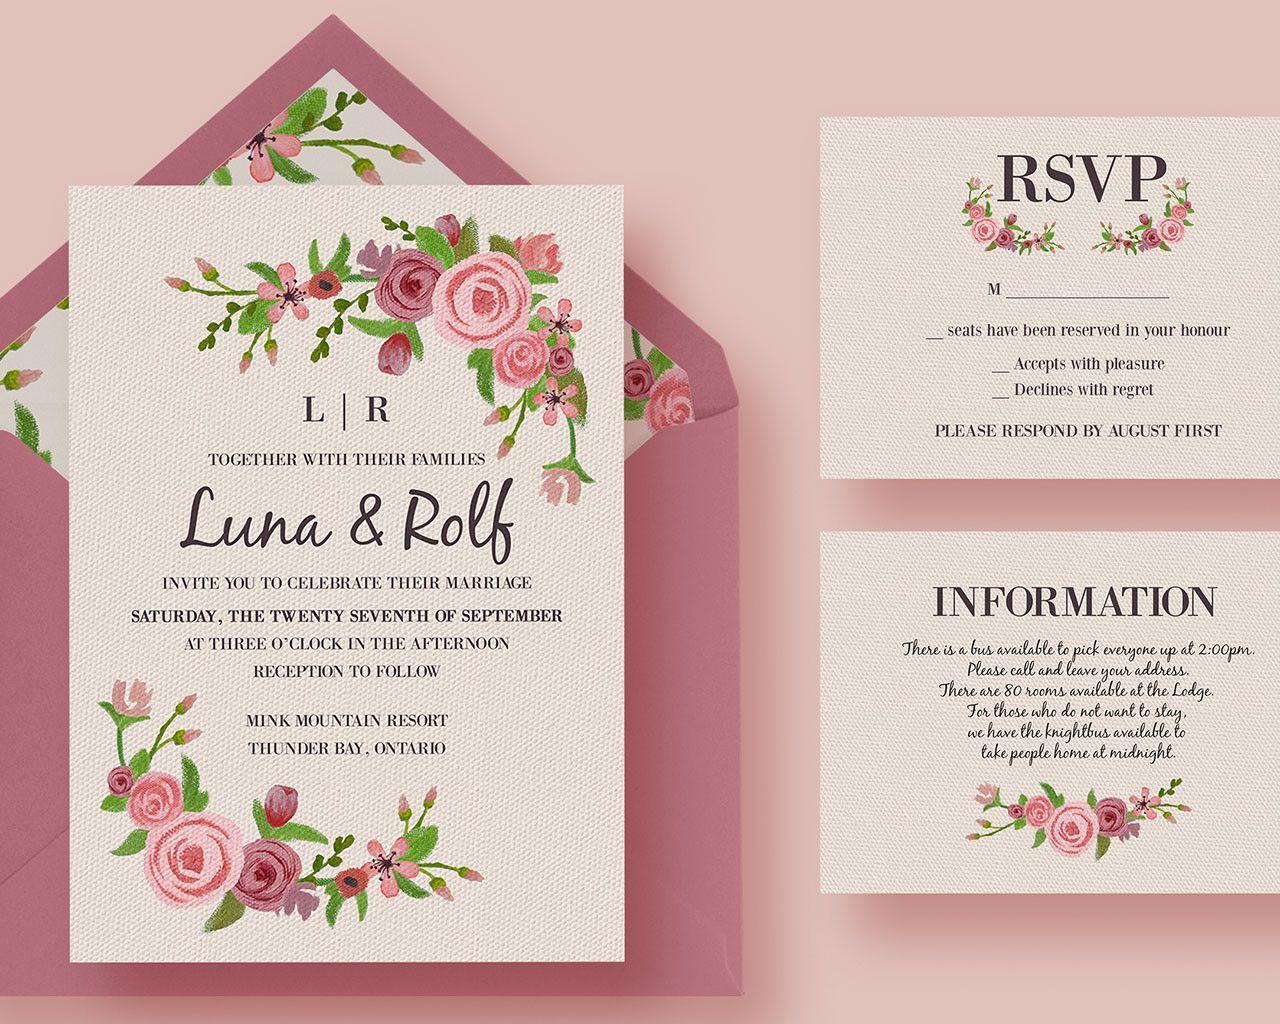 Create Wedding Invitations.Gorgeous Simple Wedding Invitation Designs Wedding Invitation Design